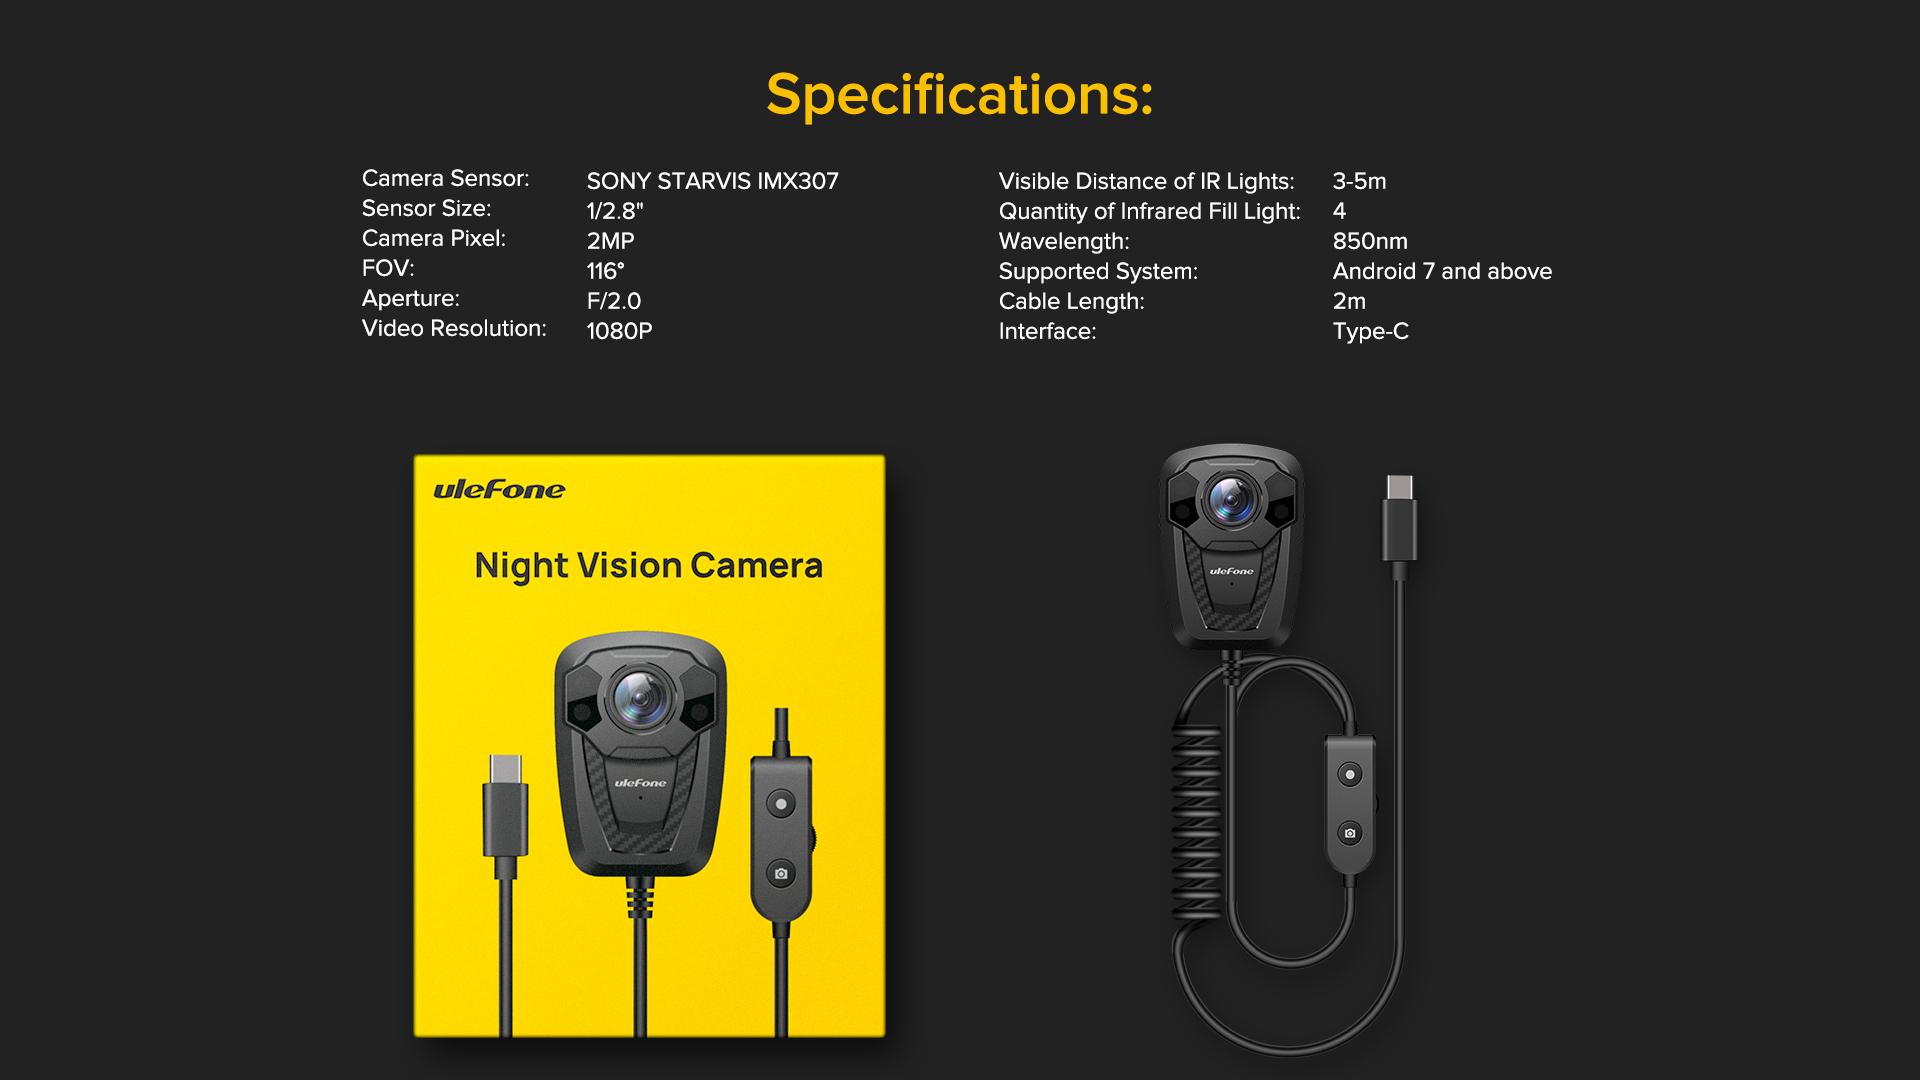 Armor 11 night vision camera